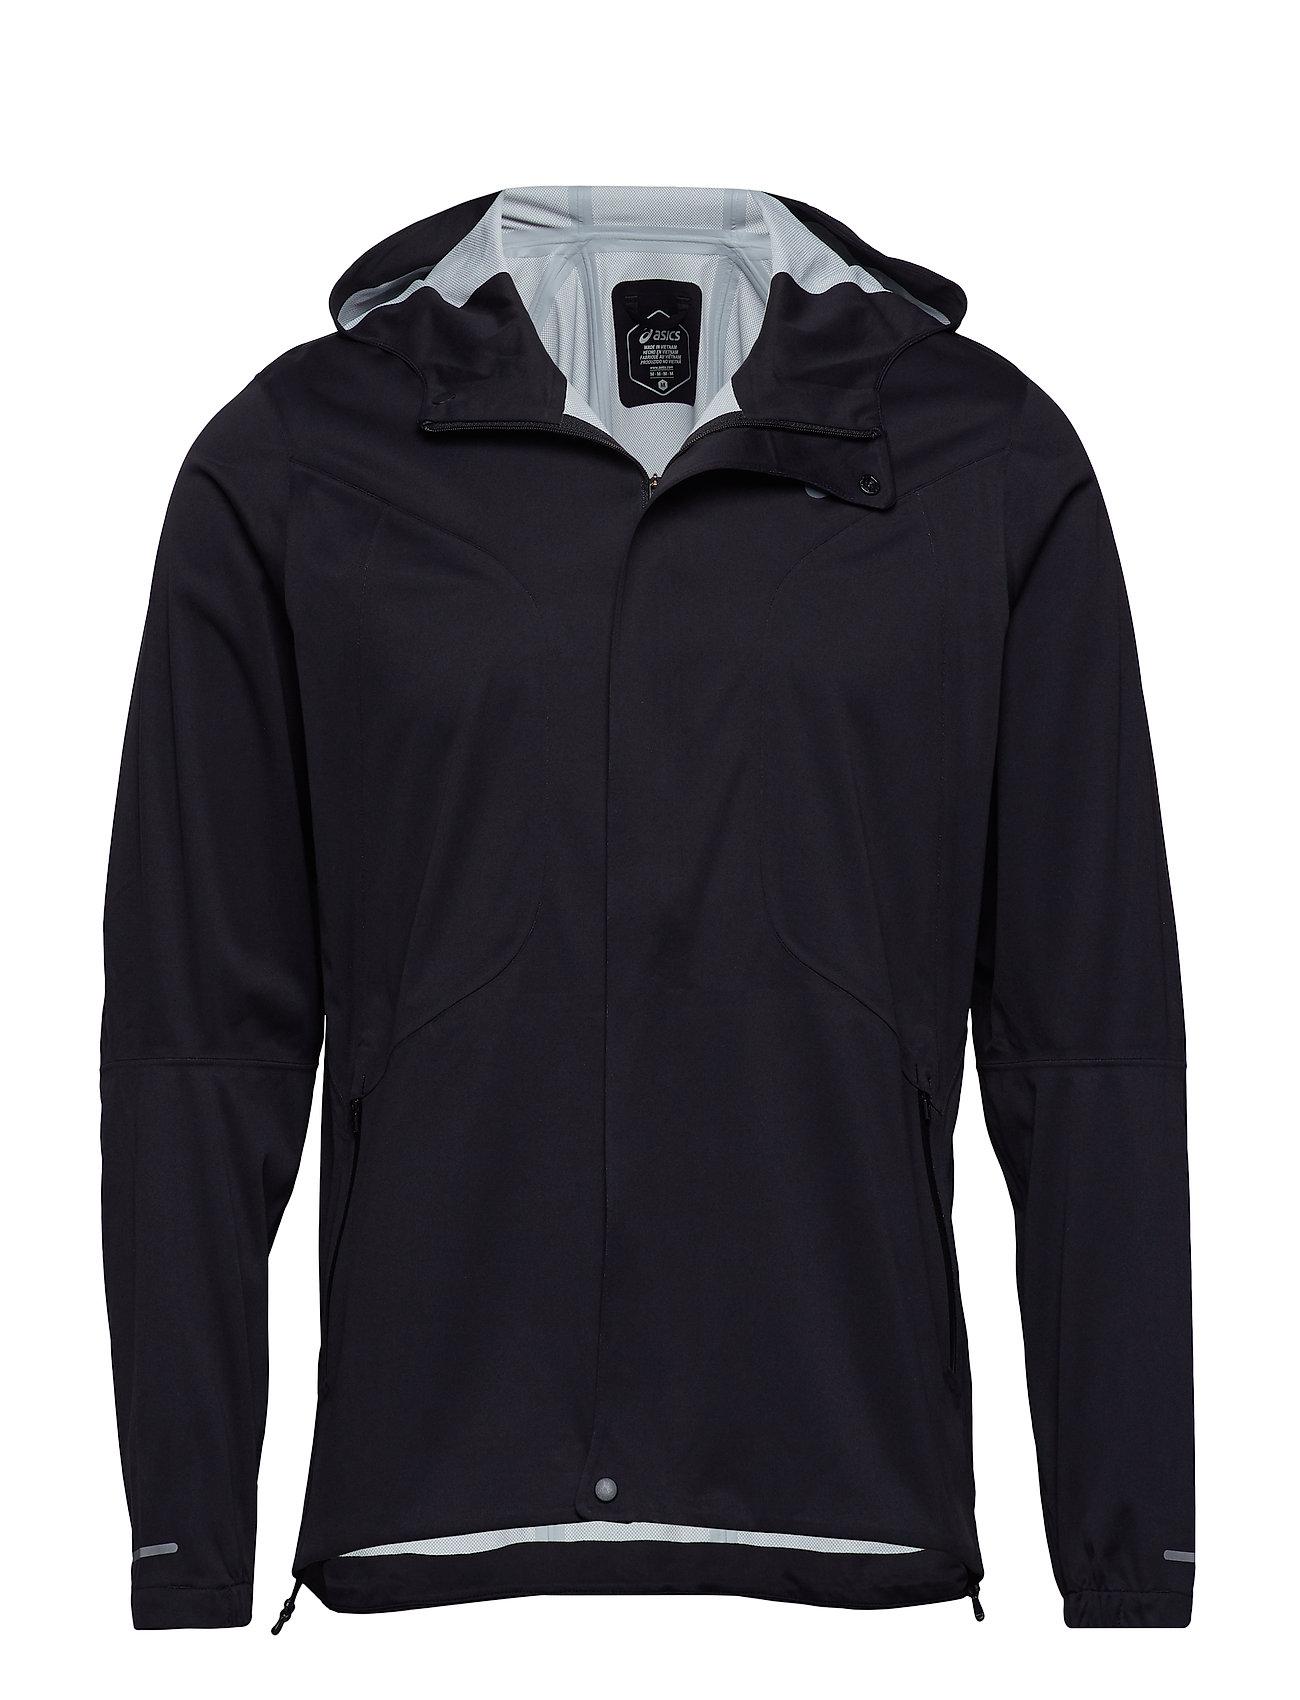 ASICS Accelerate Jacket Outerwear Sport Jackets Schwarz ASICS